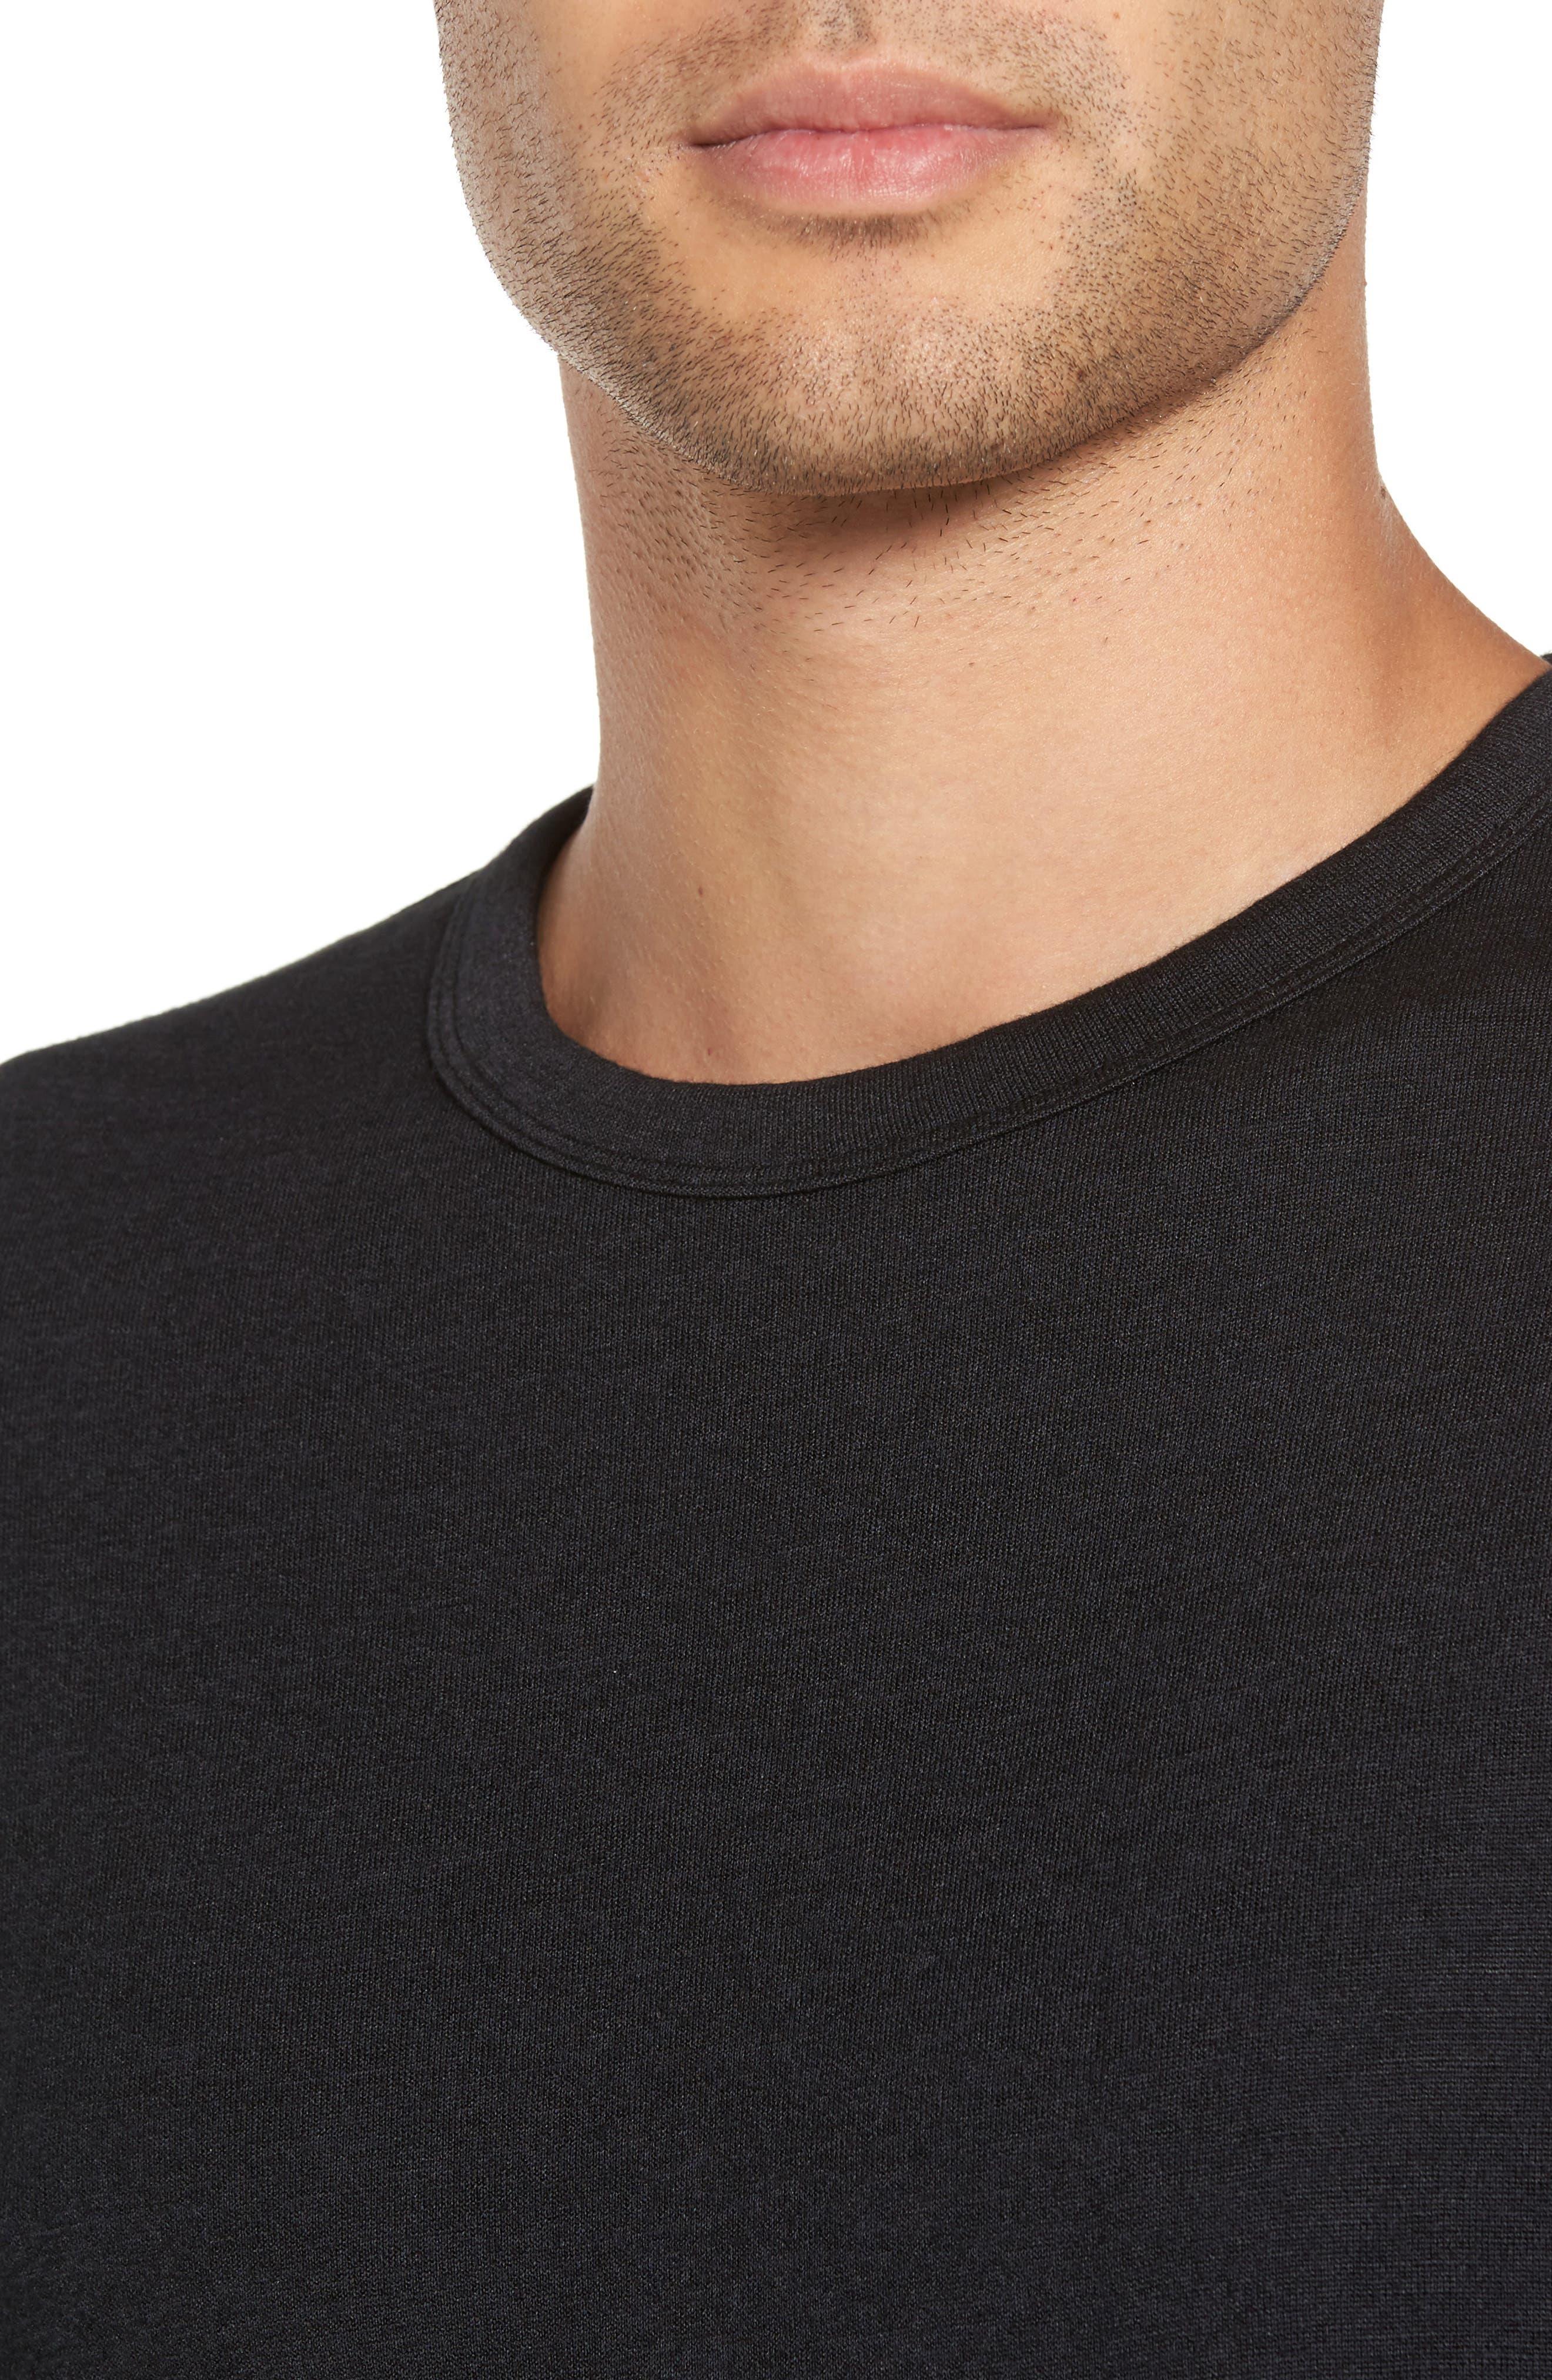 Long Sleeve T-Shirt,                             Alternate thumbnail 4, color,                             008